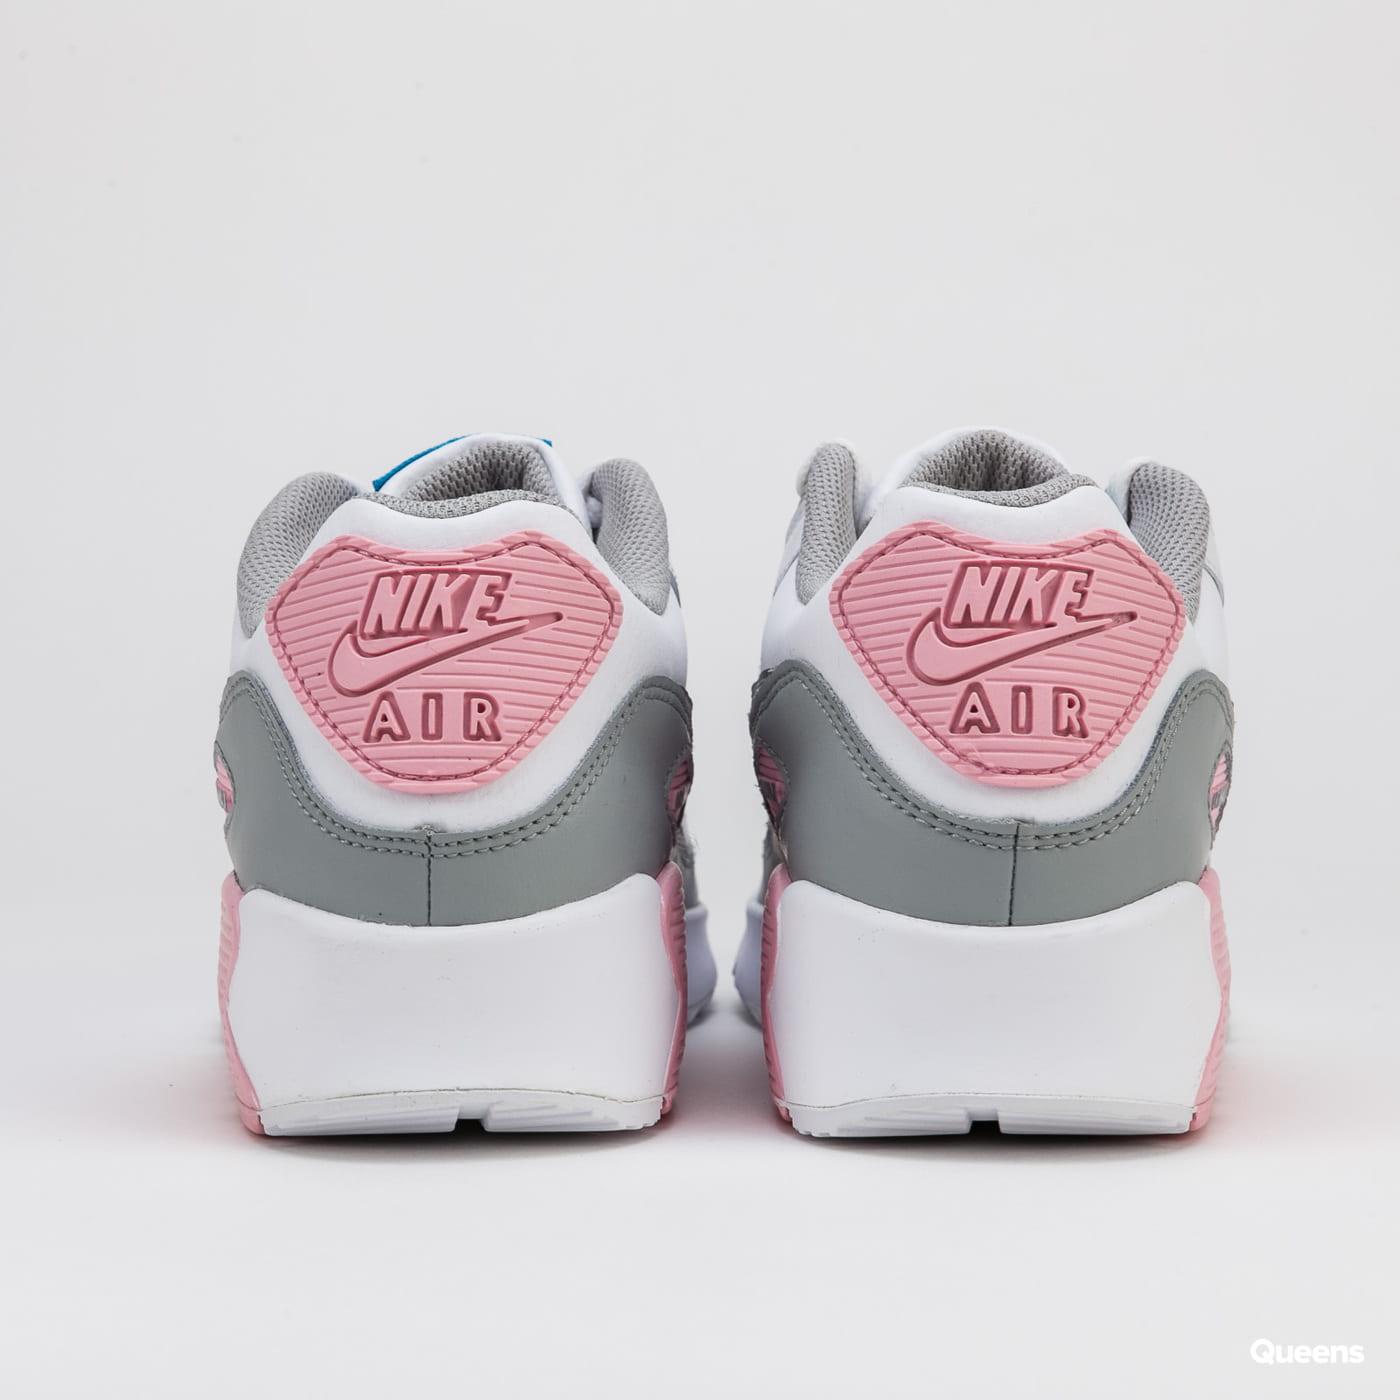 Nike Air Max 90 Leather (GS) lt smoke grey / metallic silver